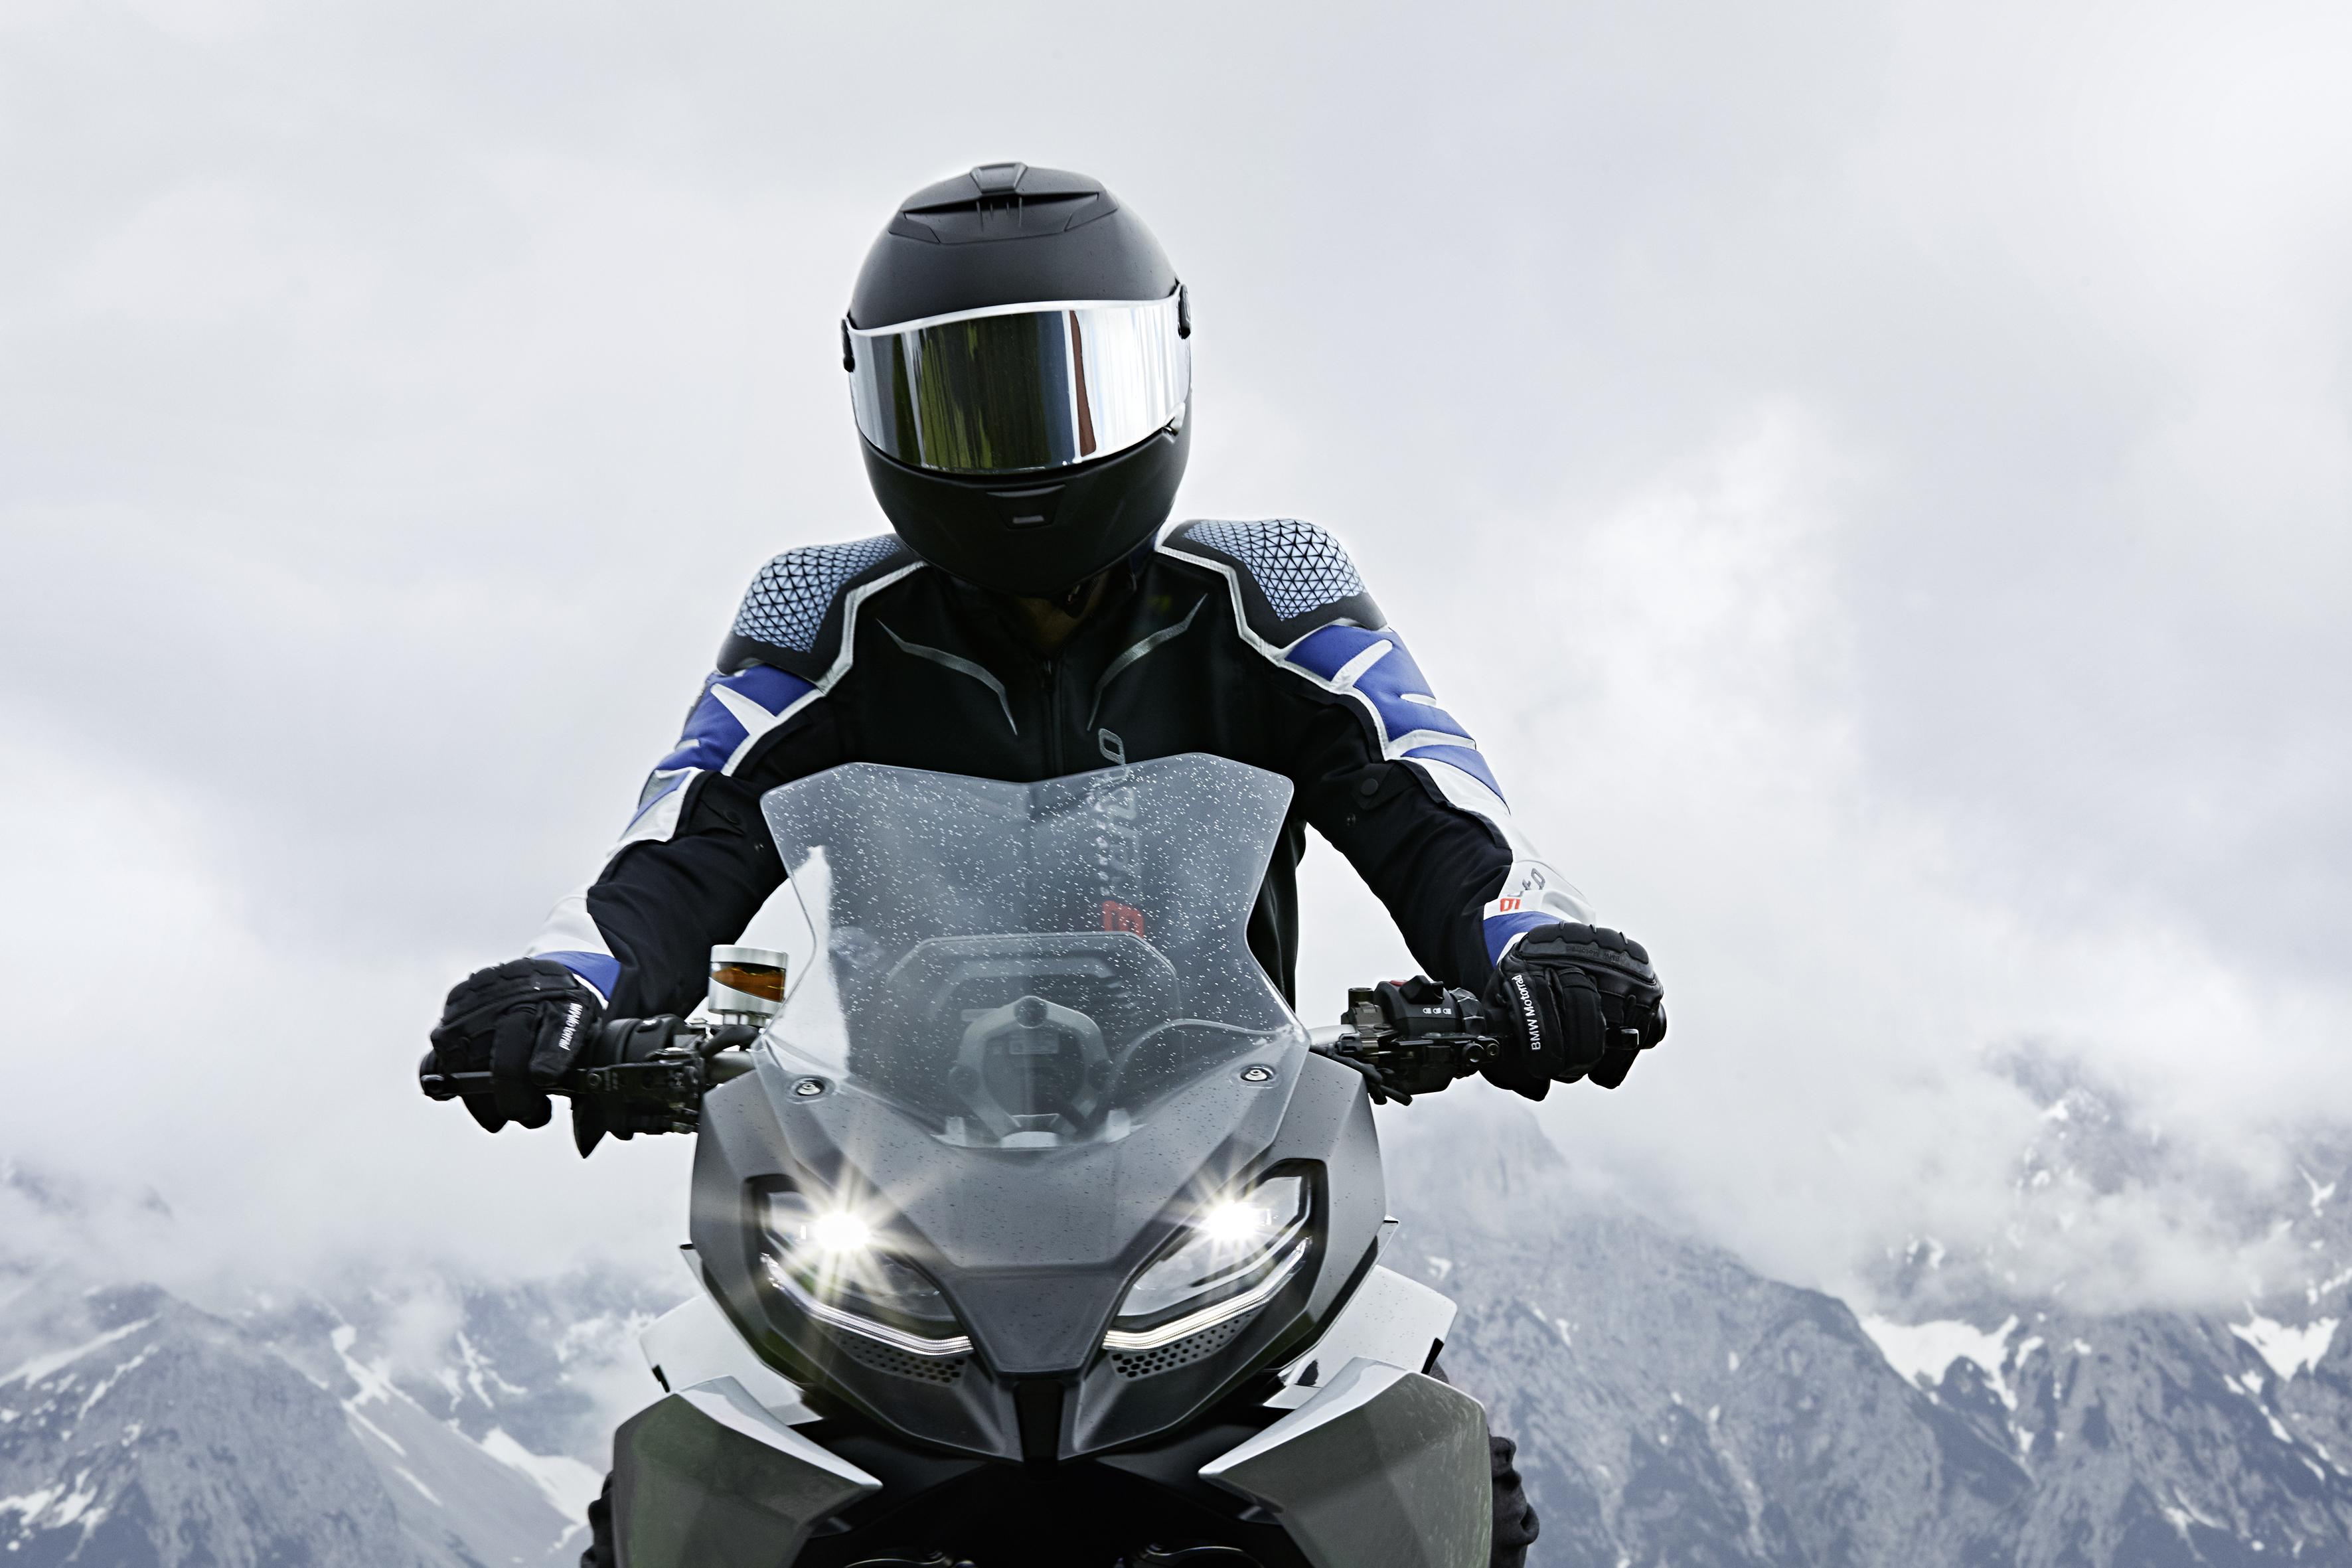 2018 BMW Motorrad Concept 9cento unveiled